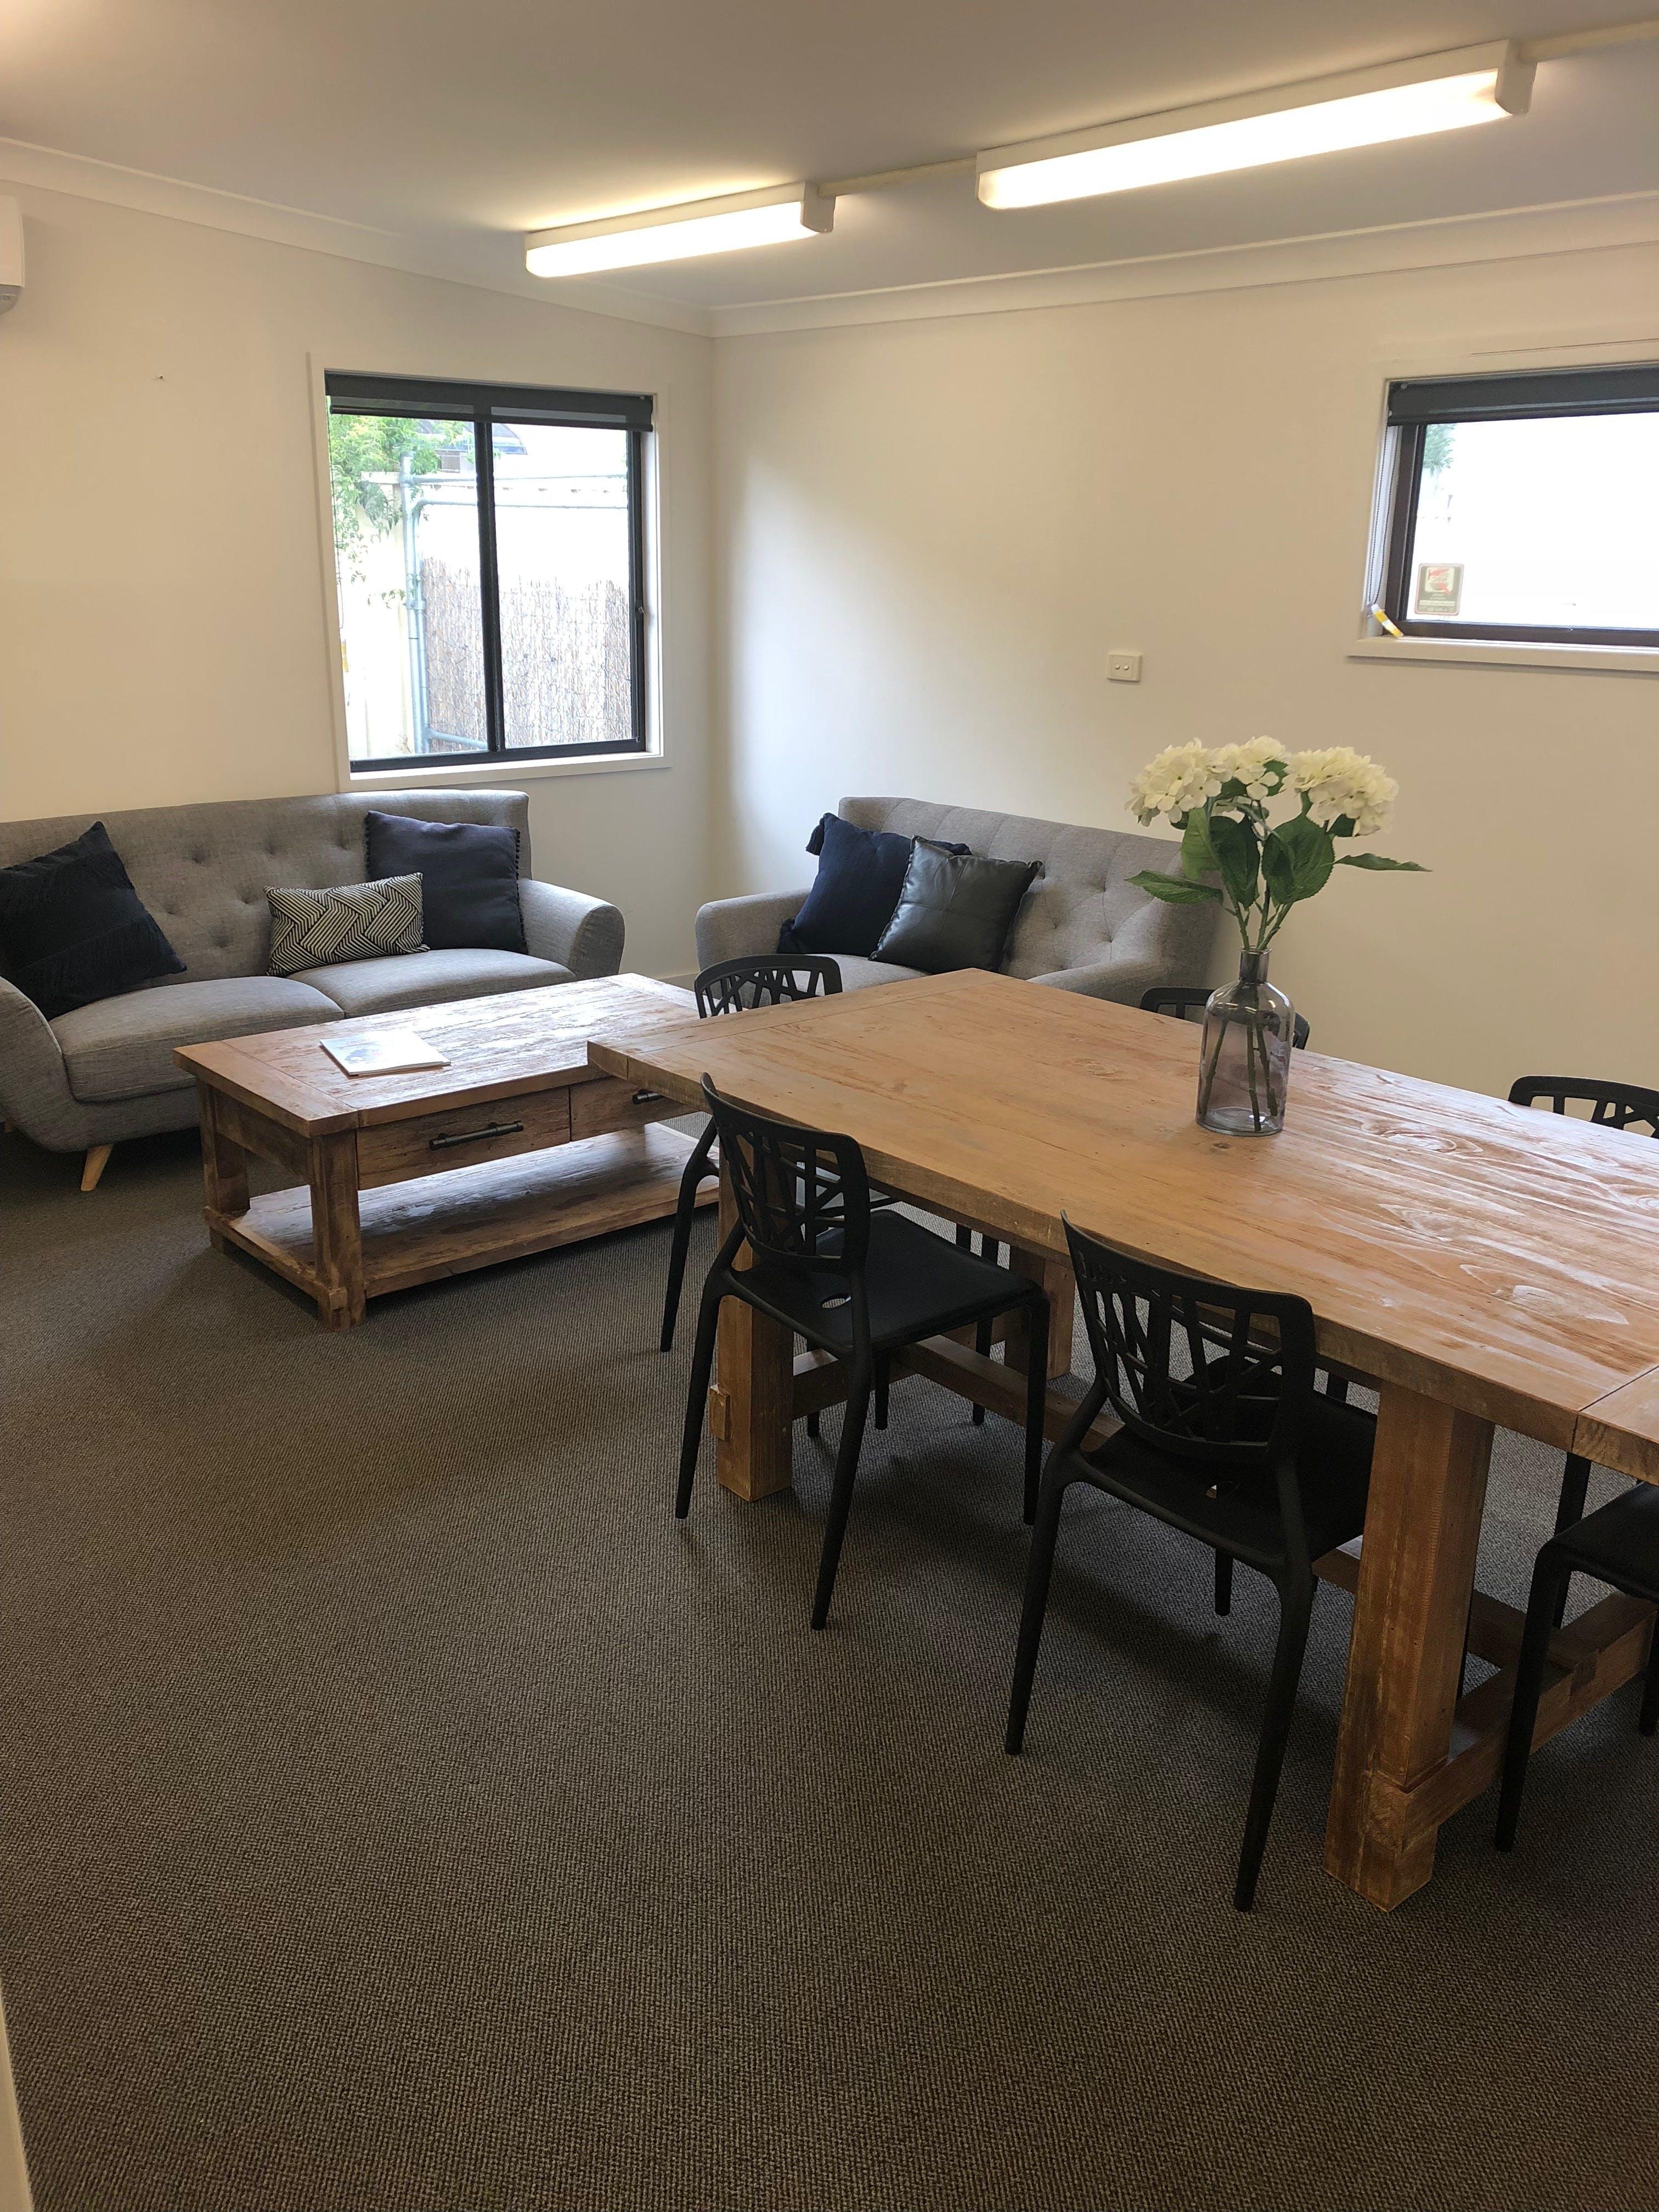 Meeting room at Lambton Office, image 1